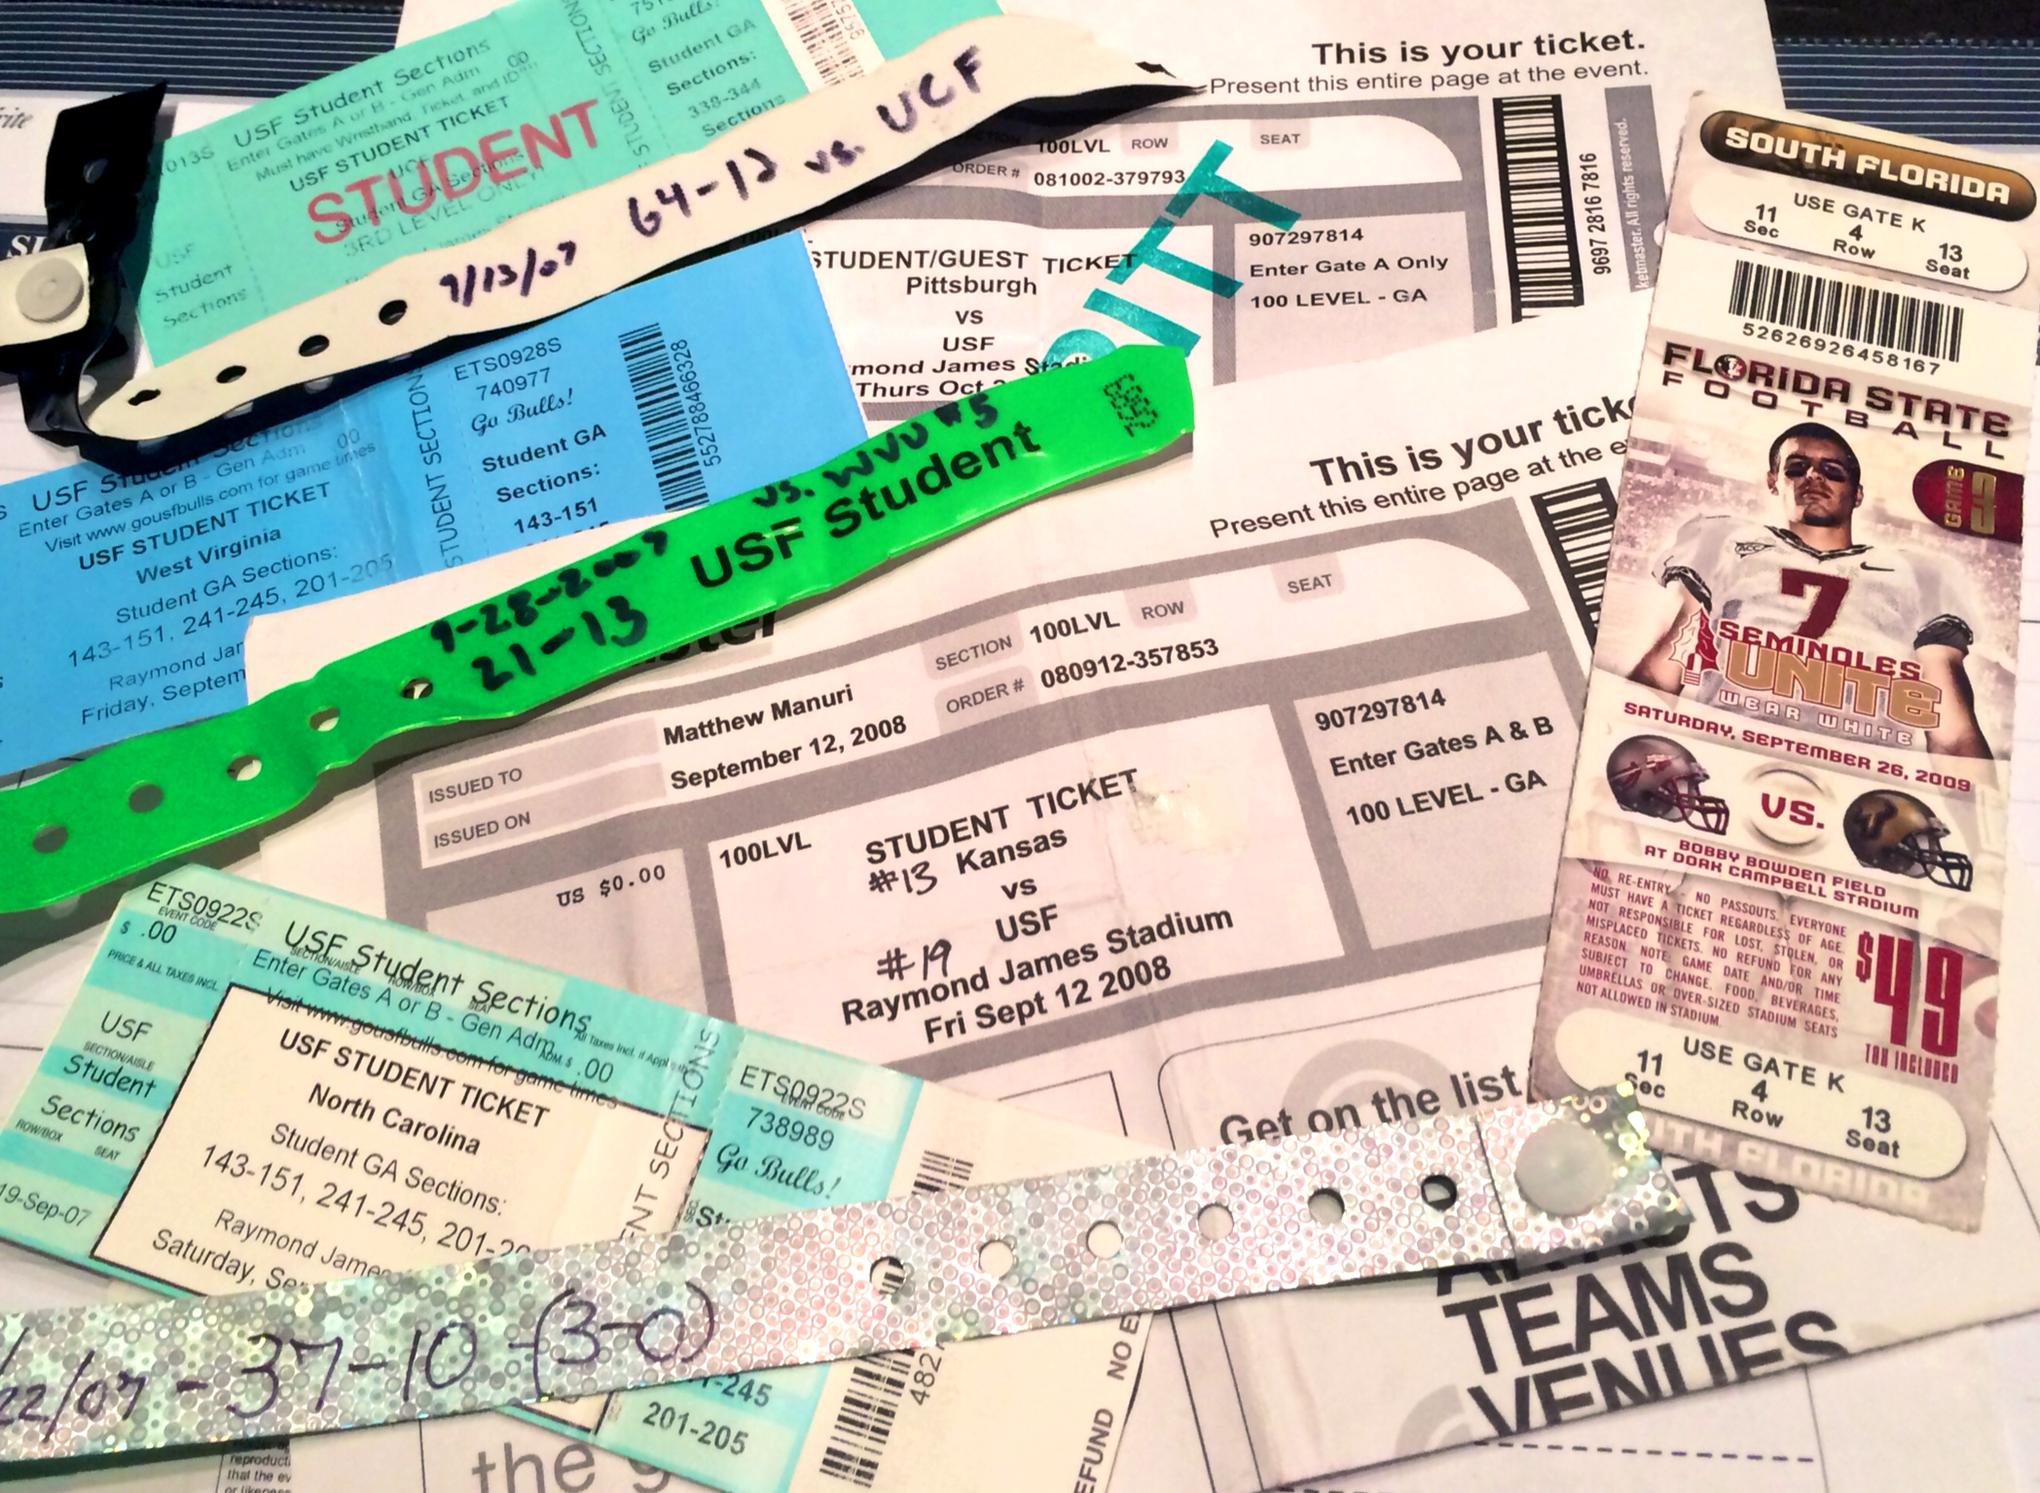 Usf_historic_wins_bands___tickets_by_matthew_manuri__2096x1534_